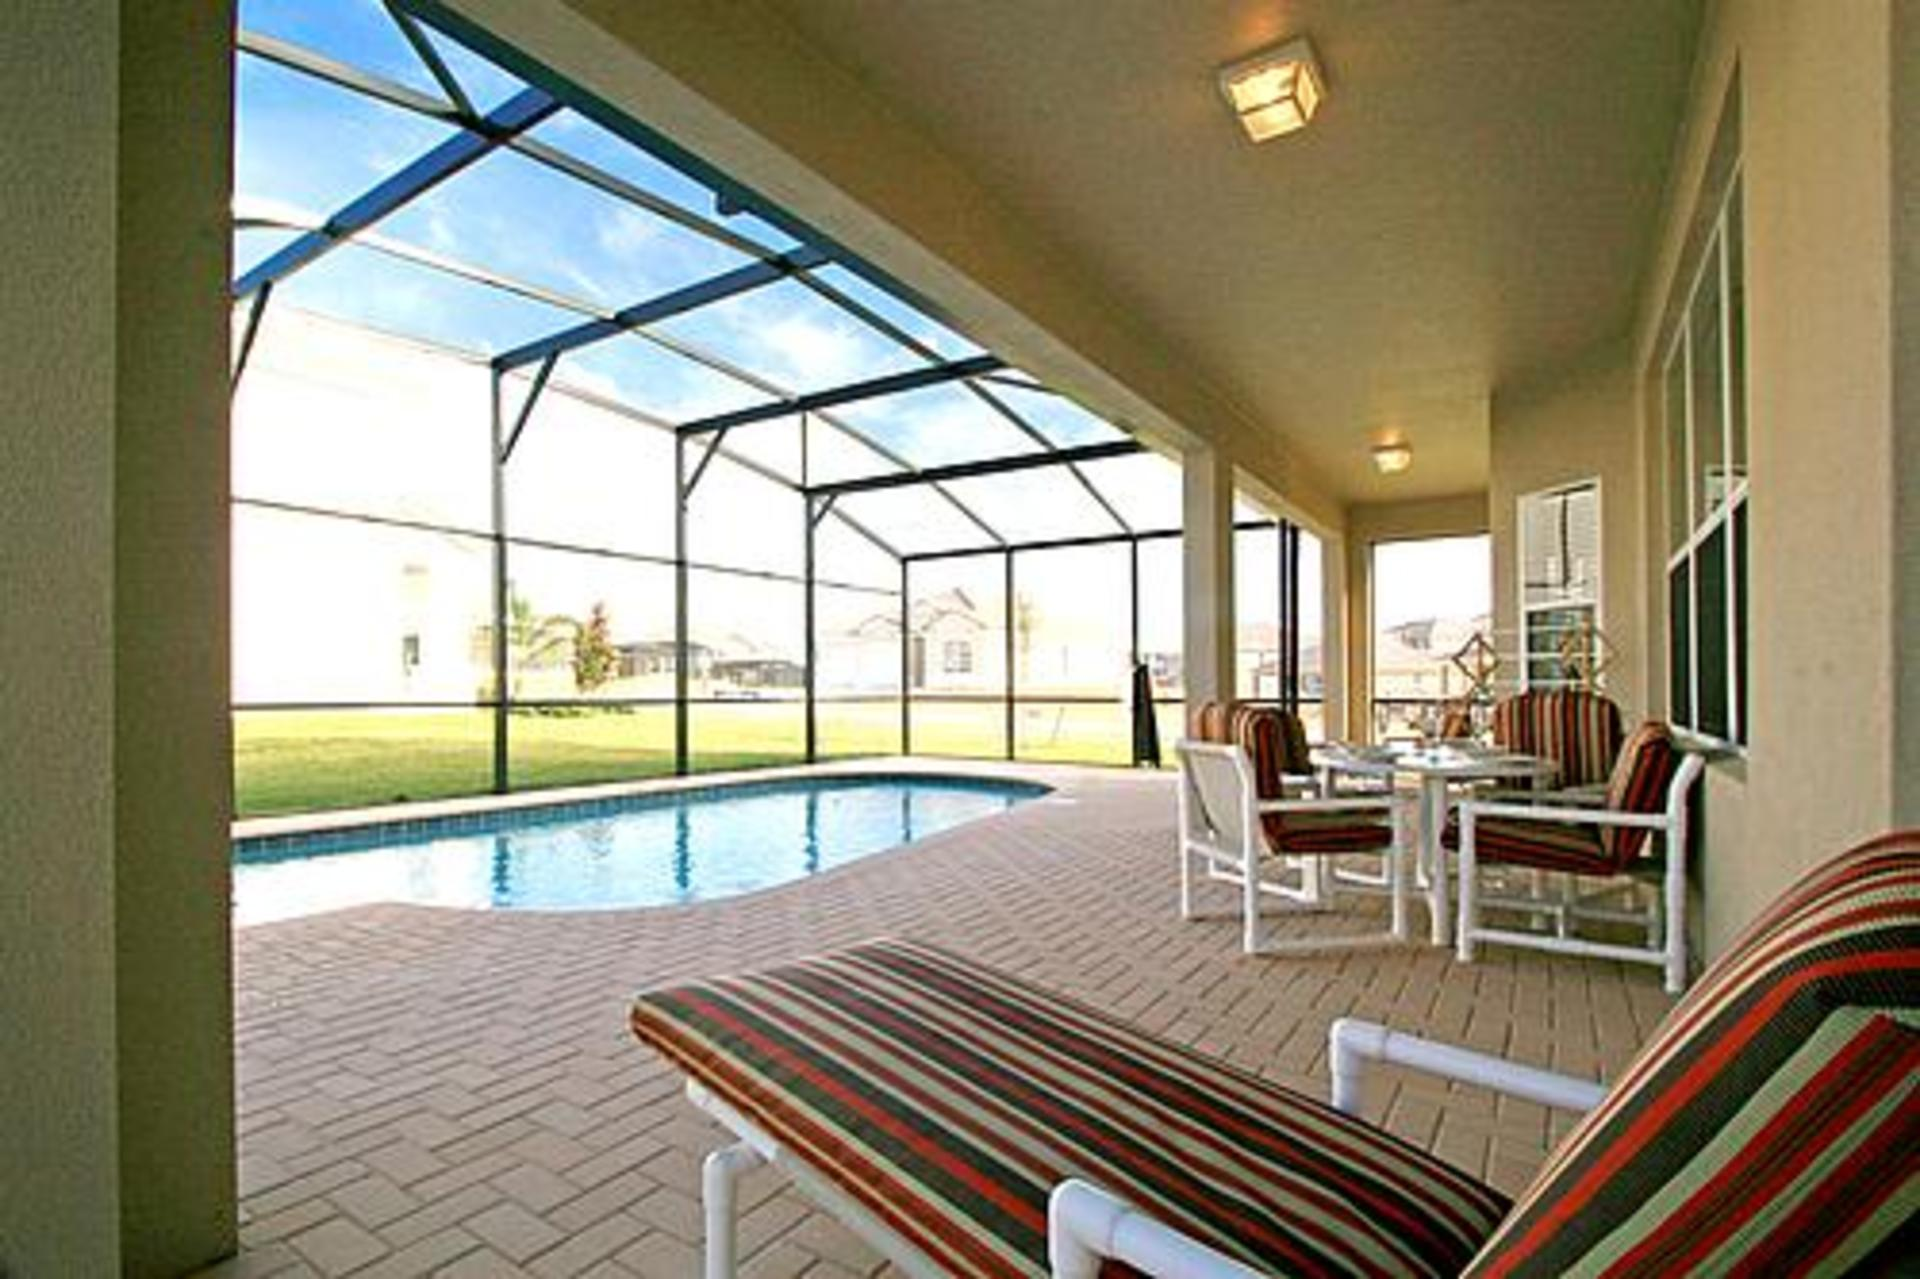 Enjoy a 5 Star Villa Holiday with your Family, Windsor Hills Resort, Villa Orlando 1459 photo 5803820